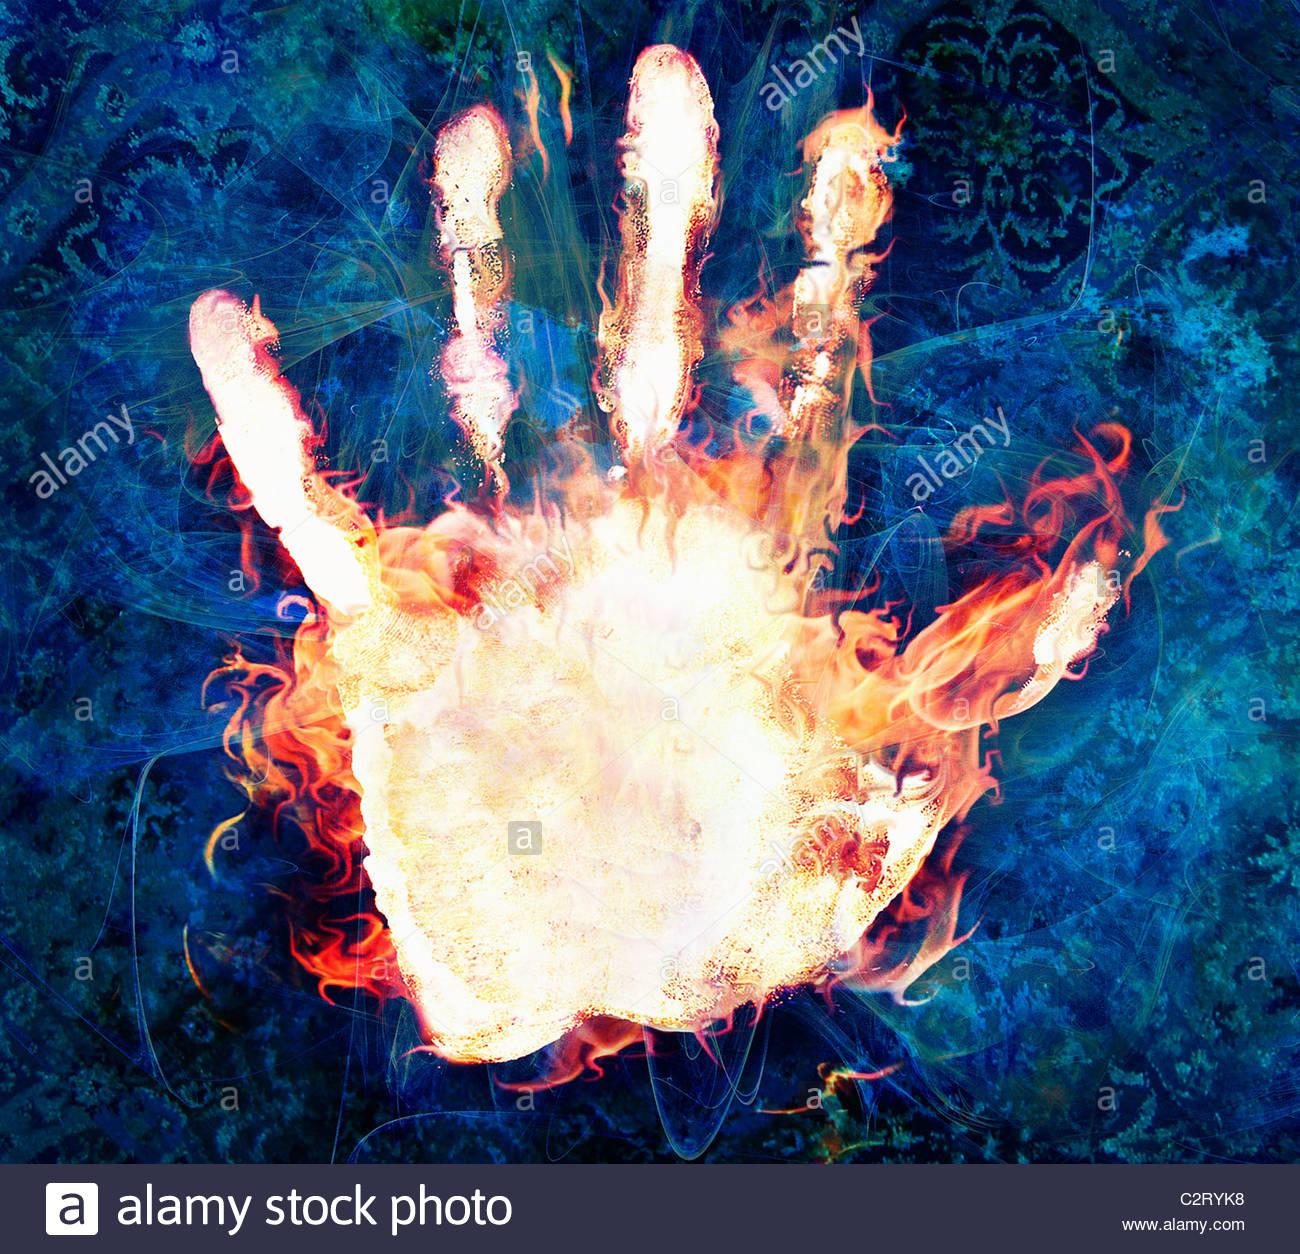 Flammes brûler sur main humaine Photo Stock